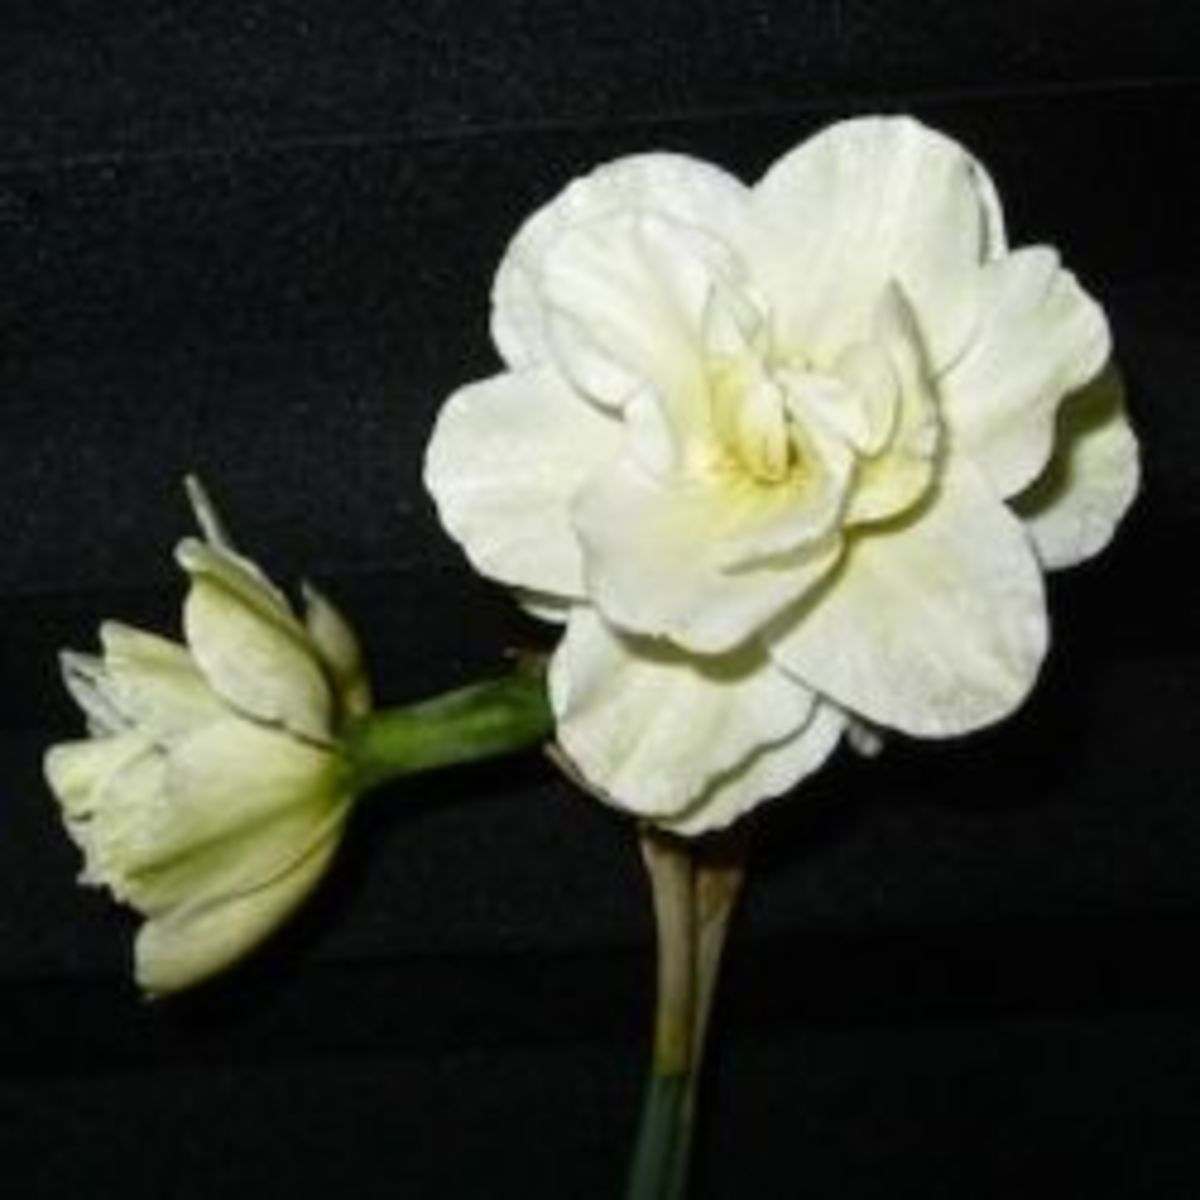 Double Narcissus Poeticus 'Daphne'